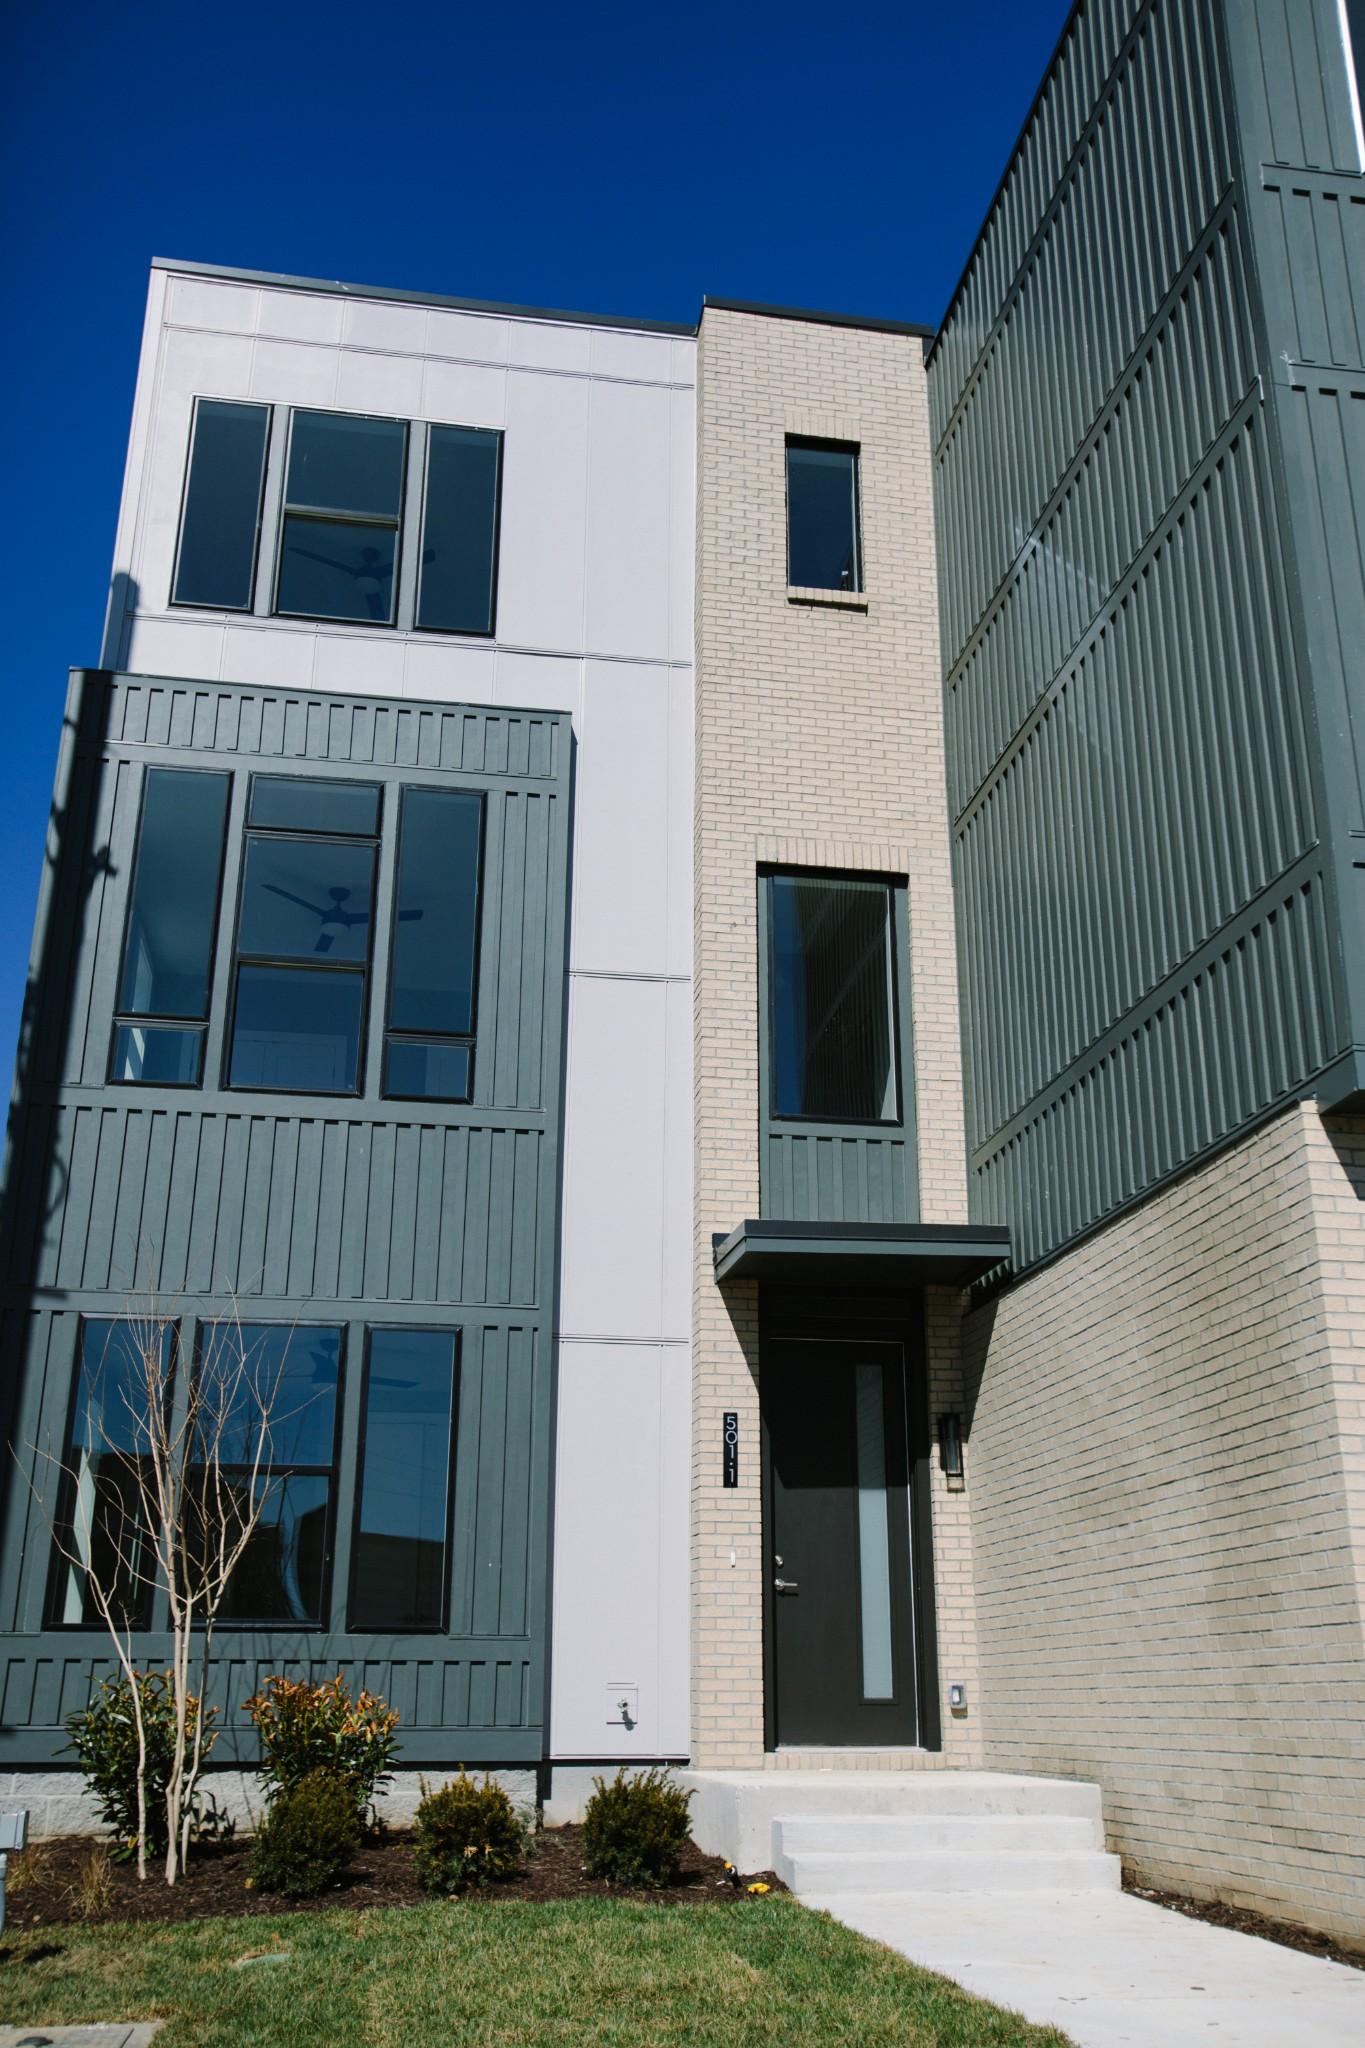 501 27th Ave N #1 Property Photo - Nashville, TN real estate listing